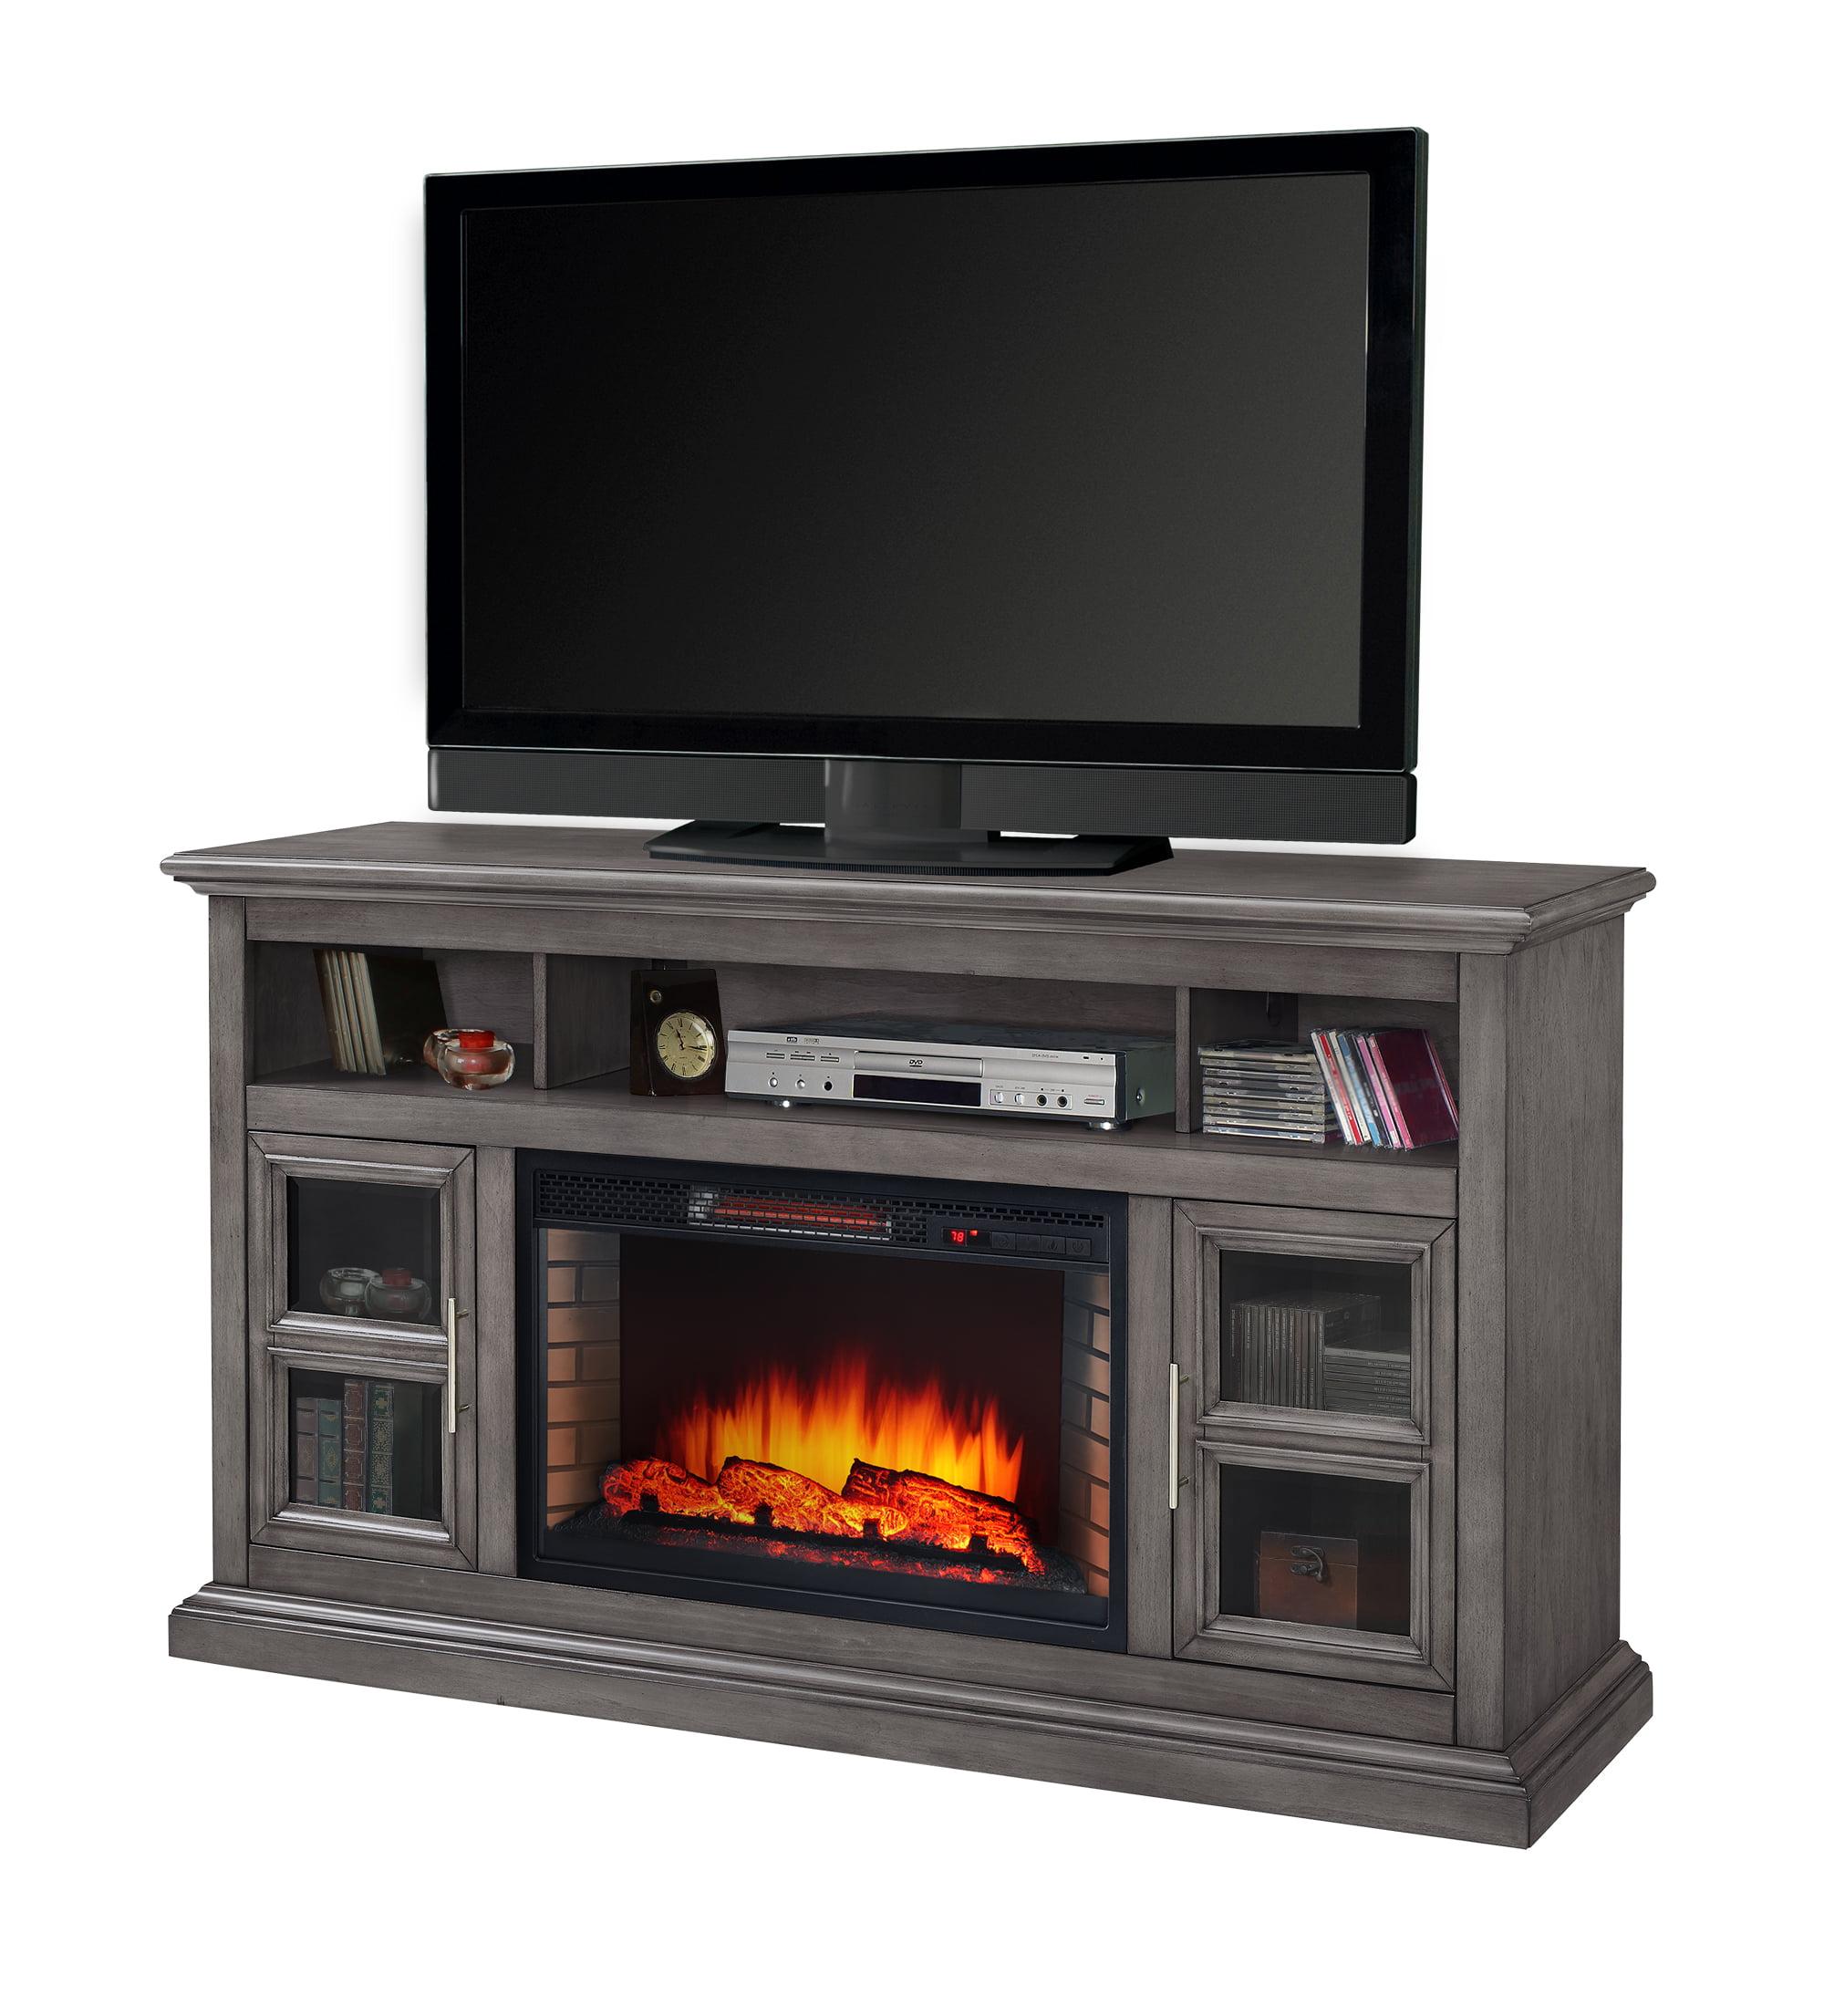 "Muskoka Glendale 58"" Media Electric Fireplace - Dark Weathered Grey"